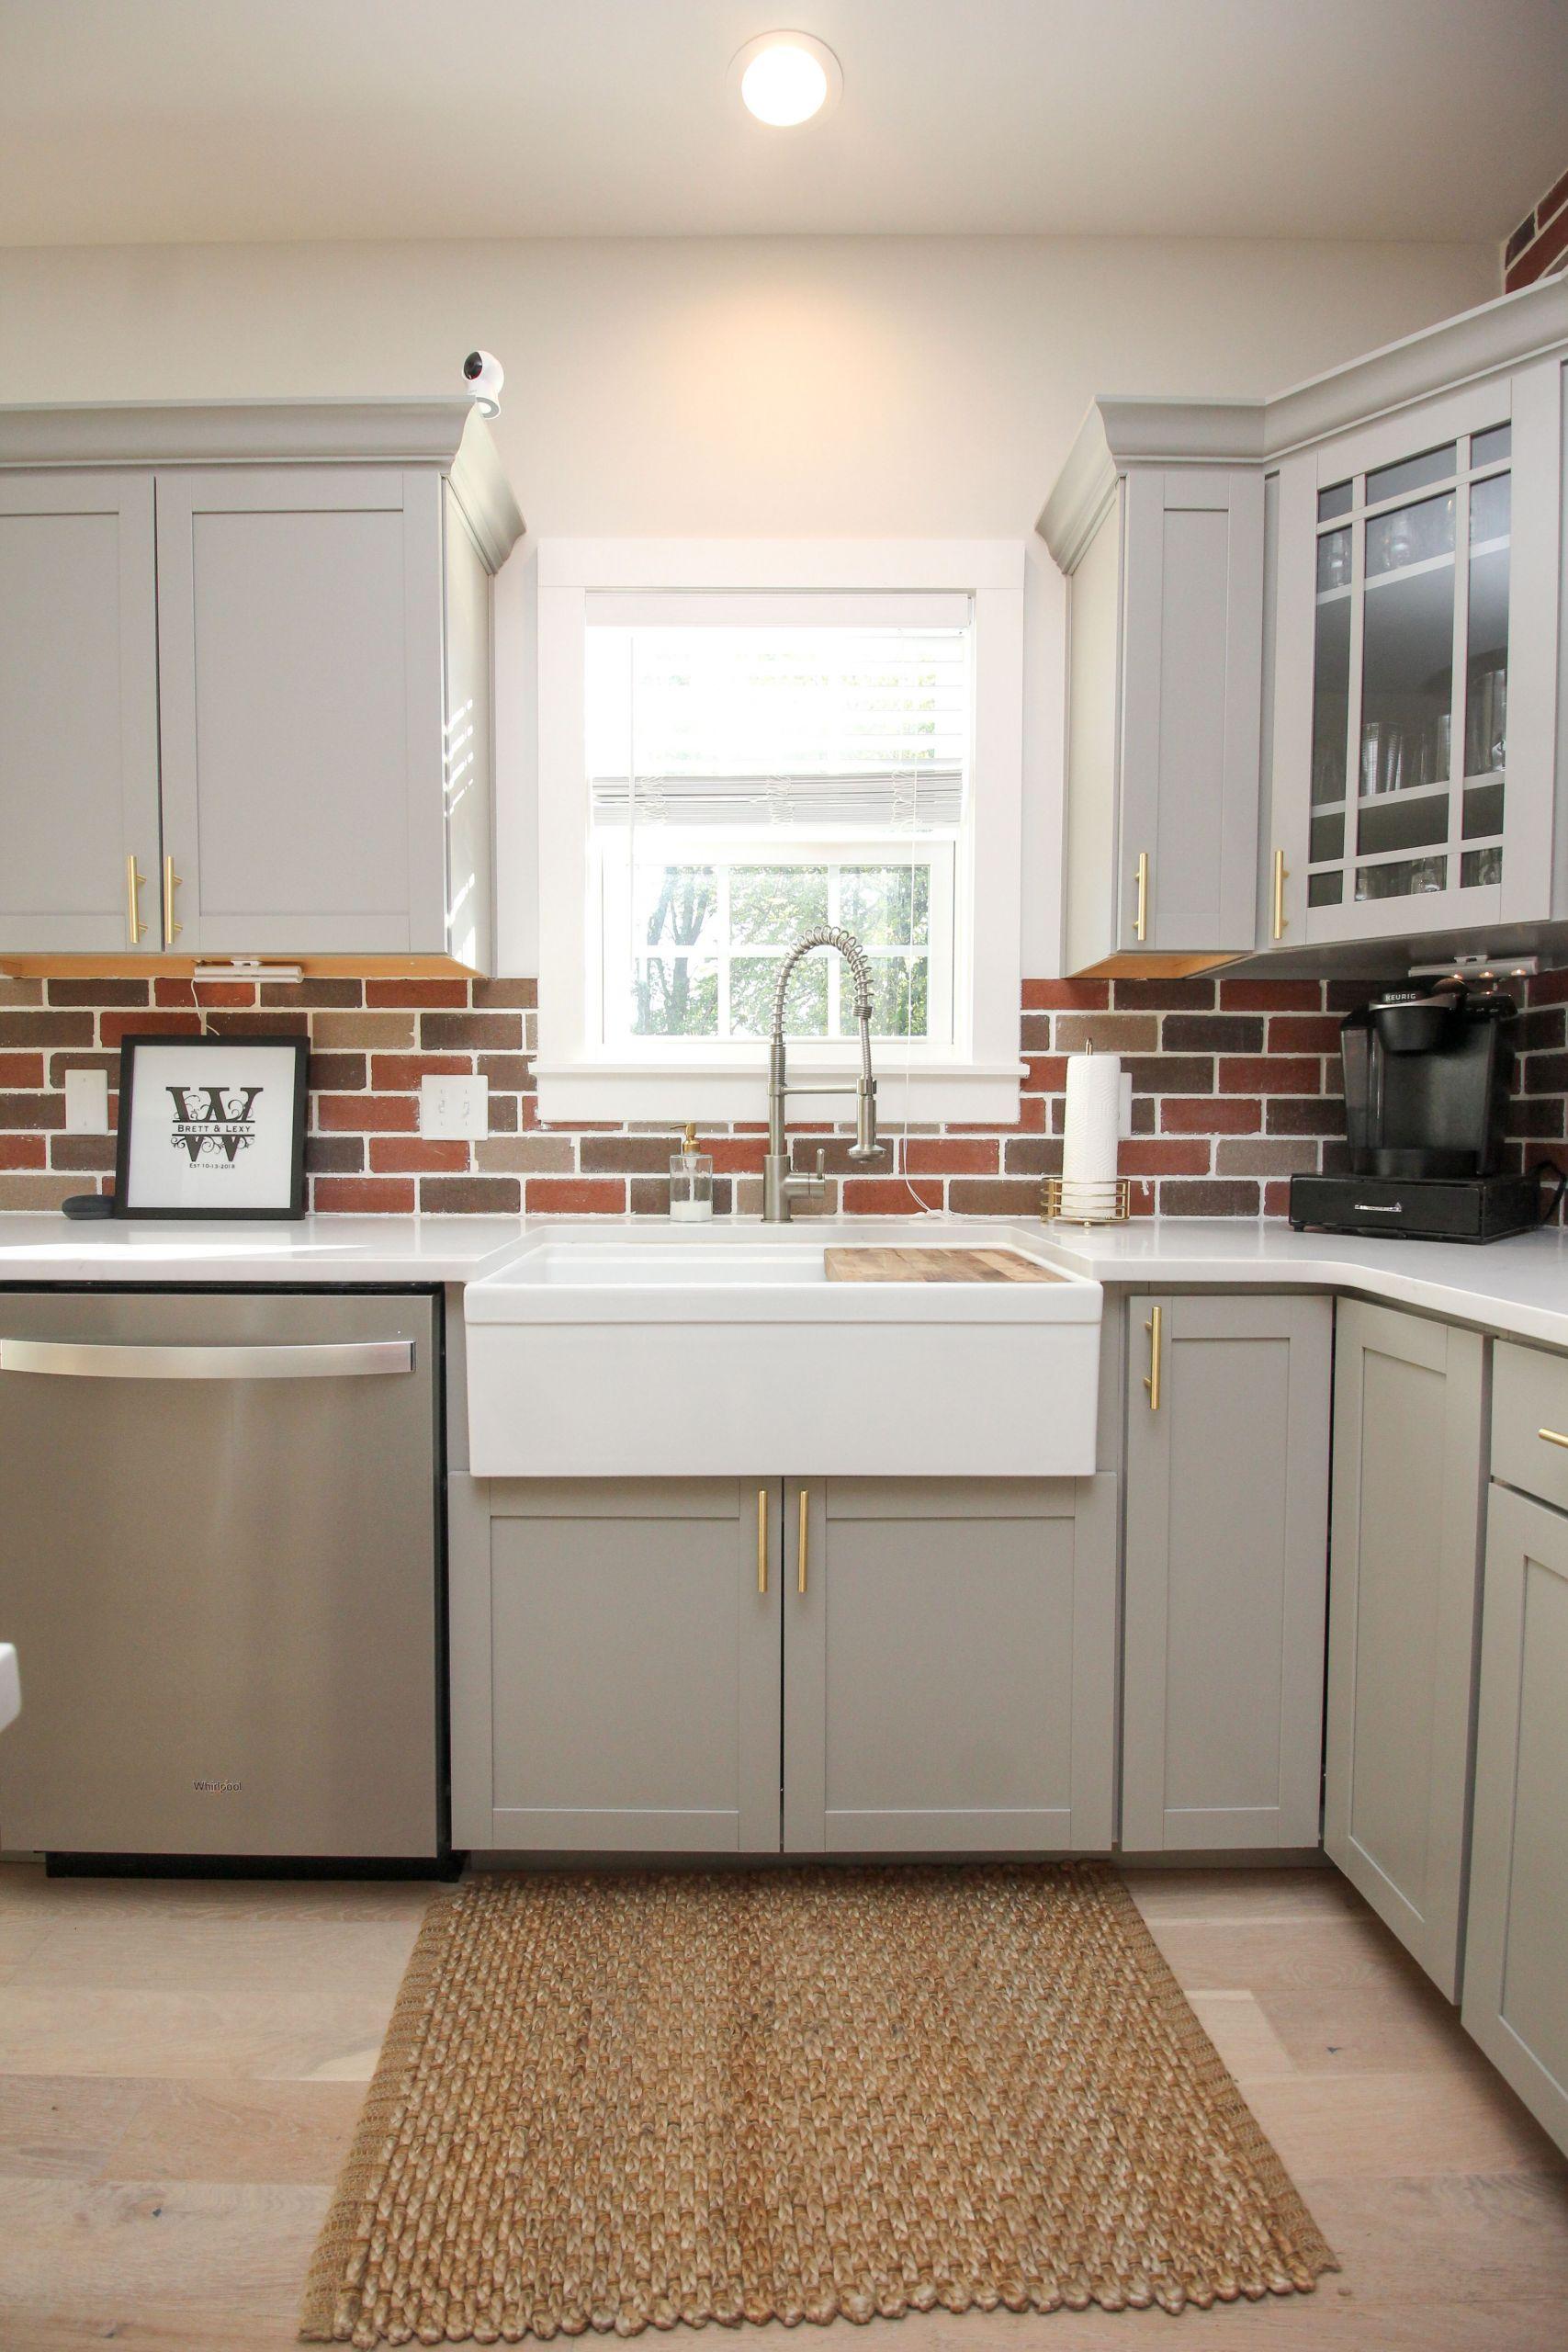 Brick Backsplash Kitchen Elegant Farmhouse Kitchen Sink with Brick Backsplash Stainless